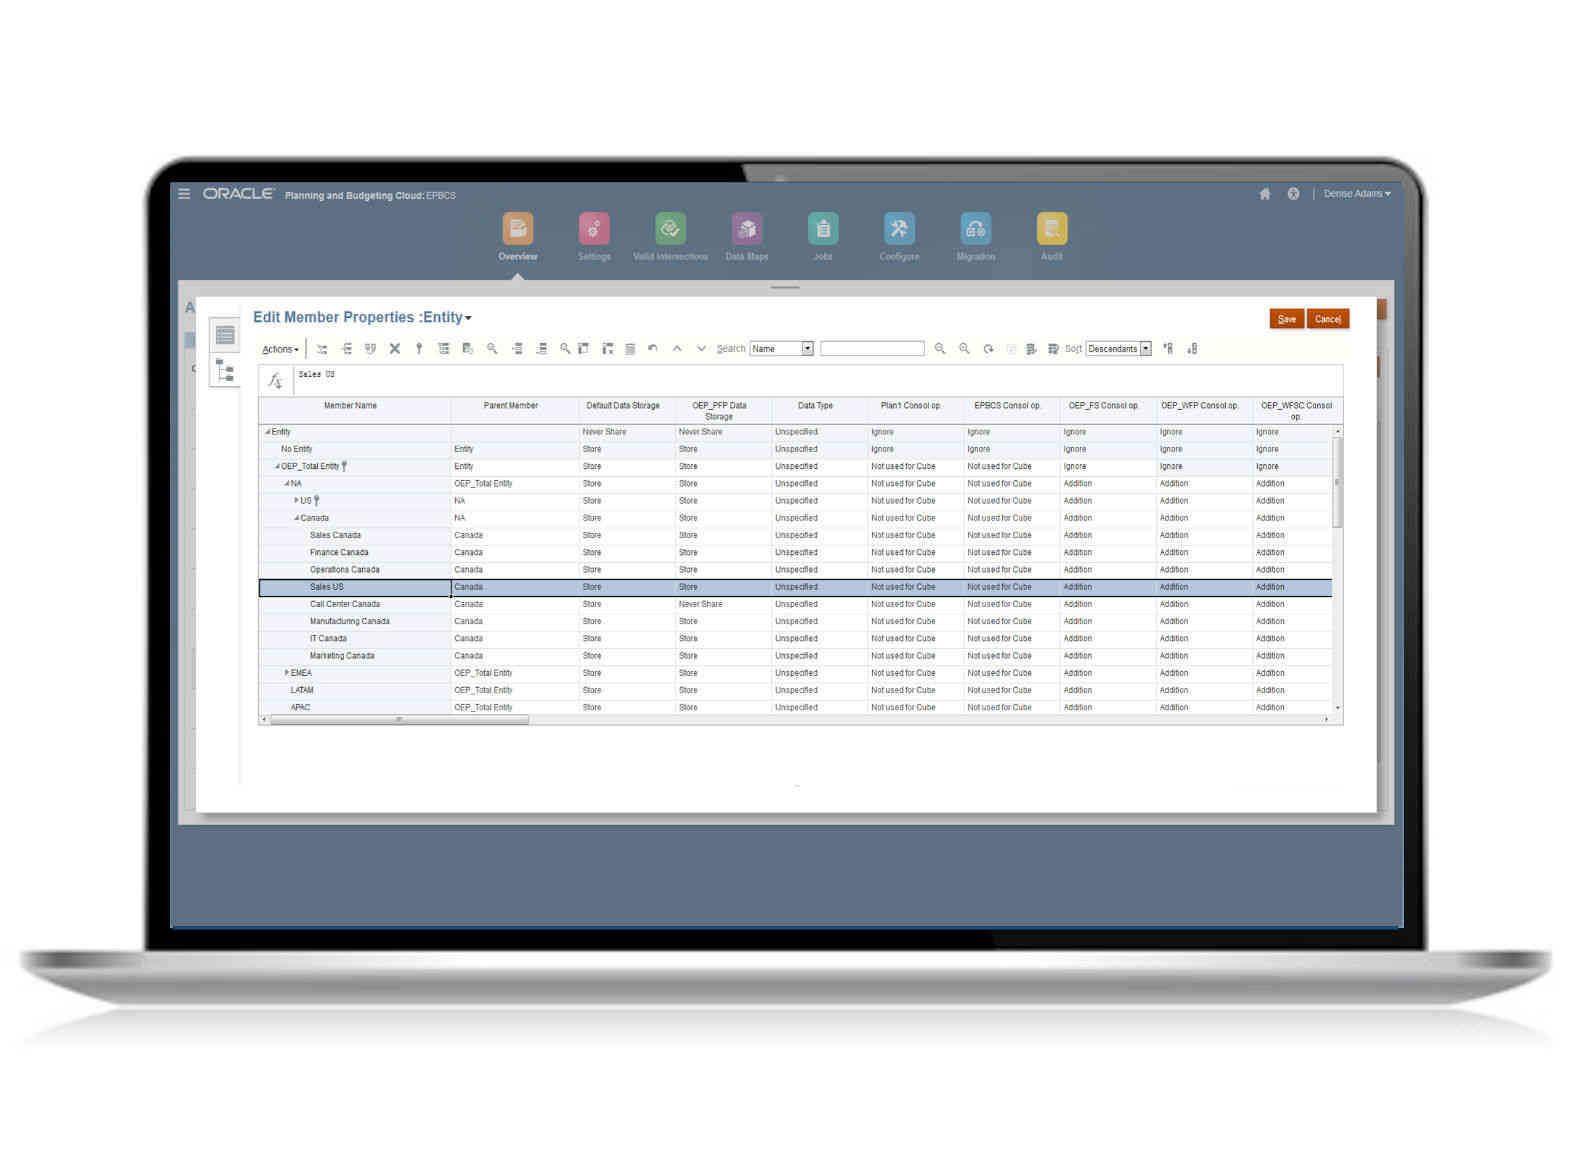 Enterprise data - EDMCS